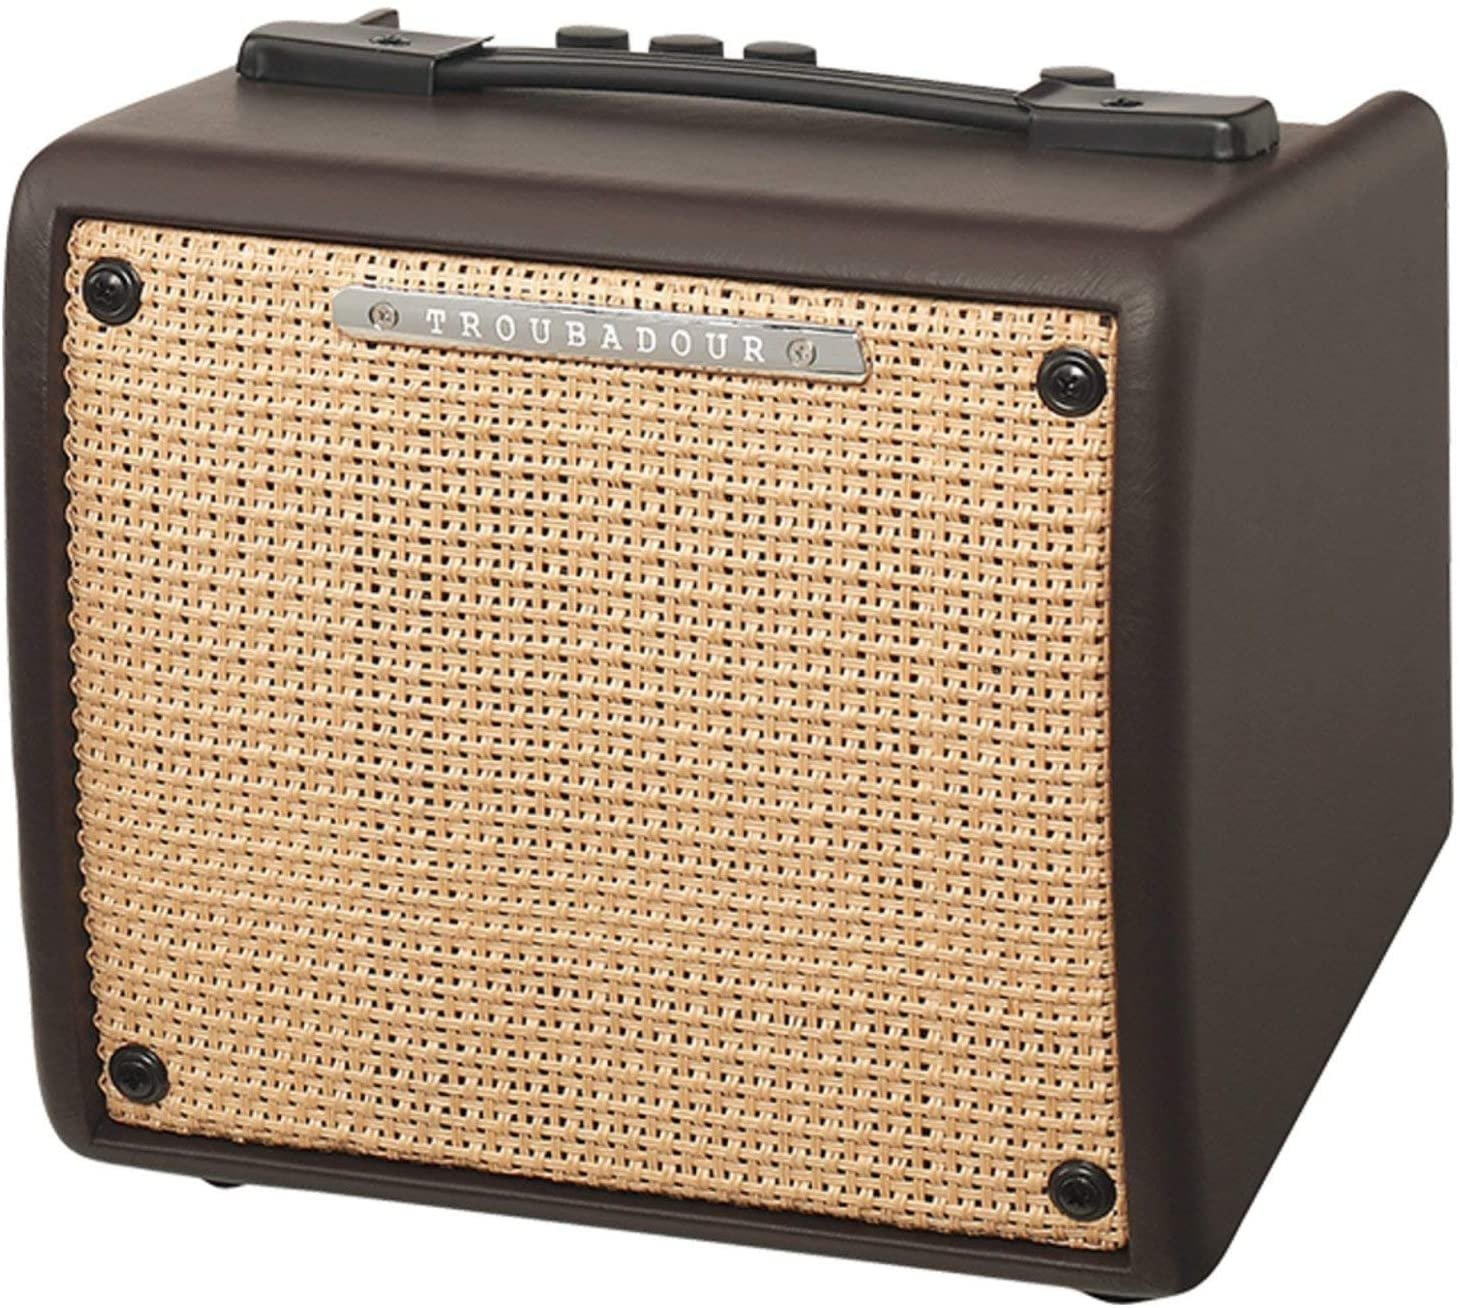 Ibanez T15II Troubadour 15w Acoustic Guitar Amp